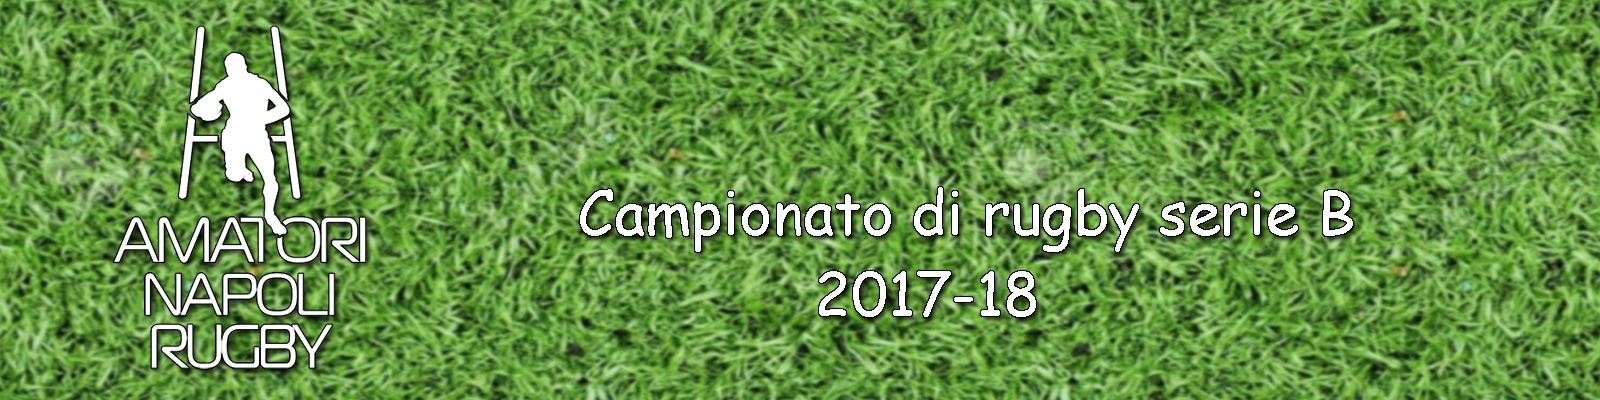 Amatori Napoli Rugby 2017-18